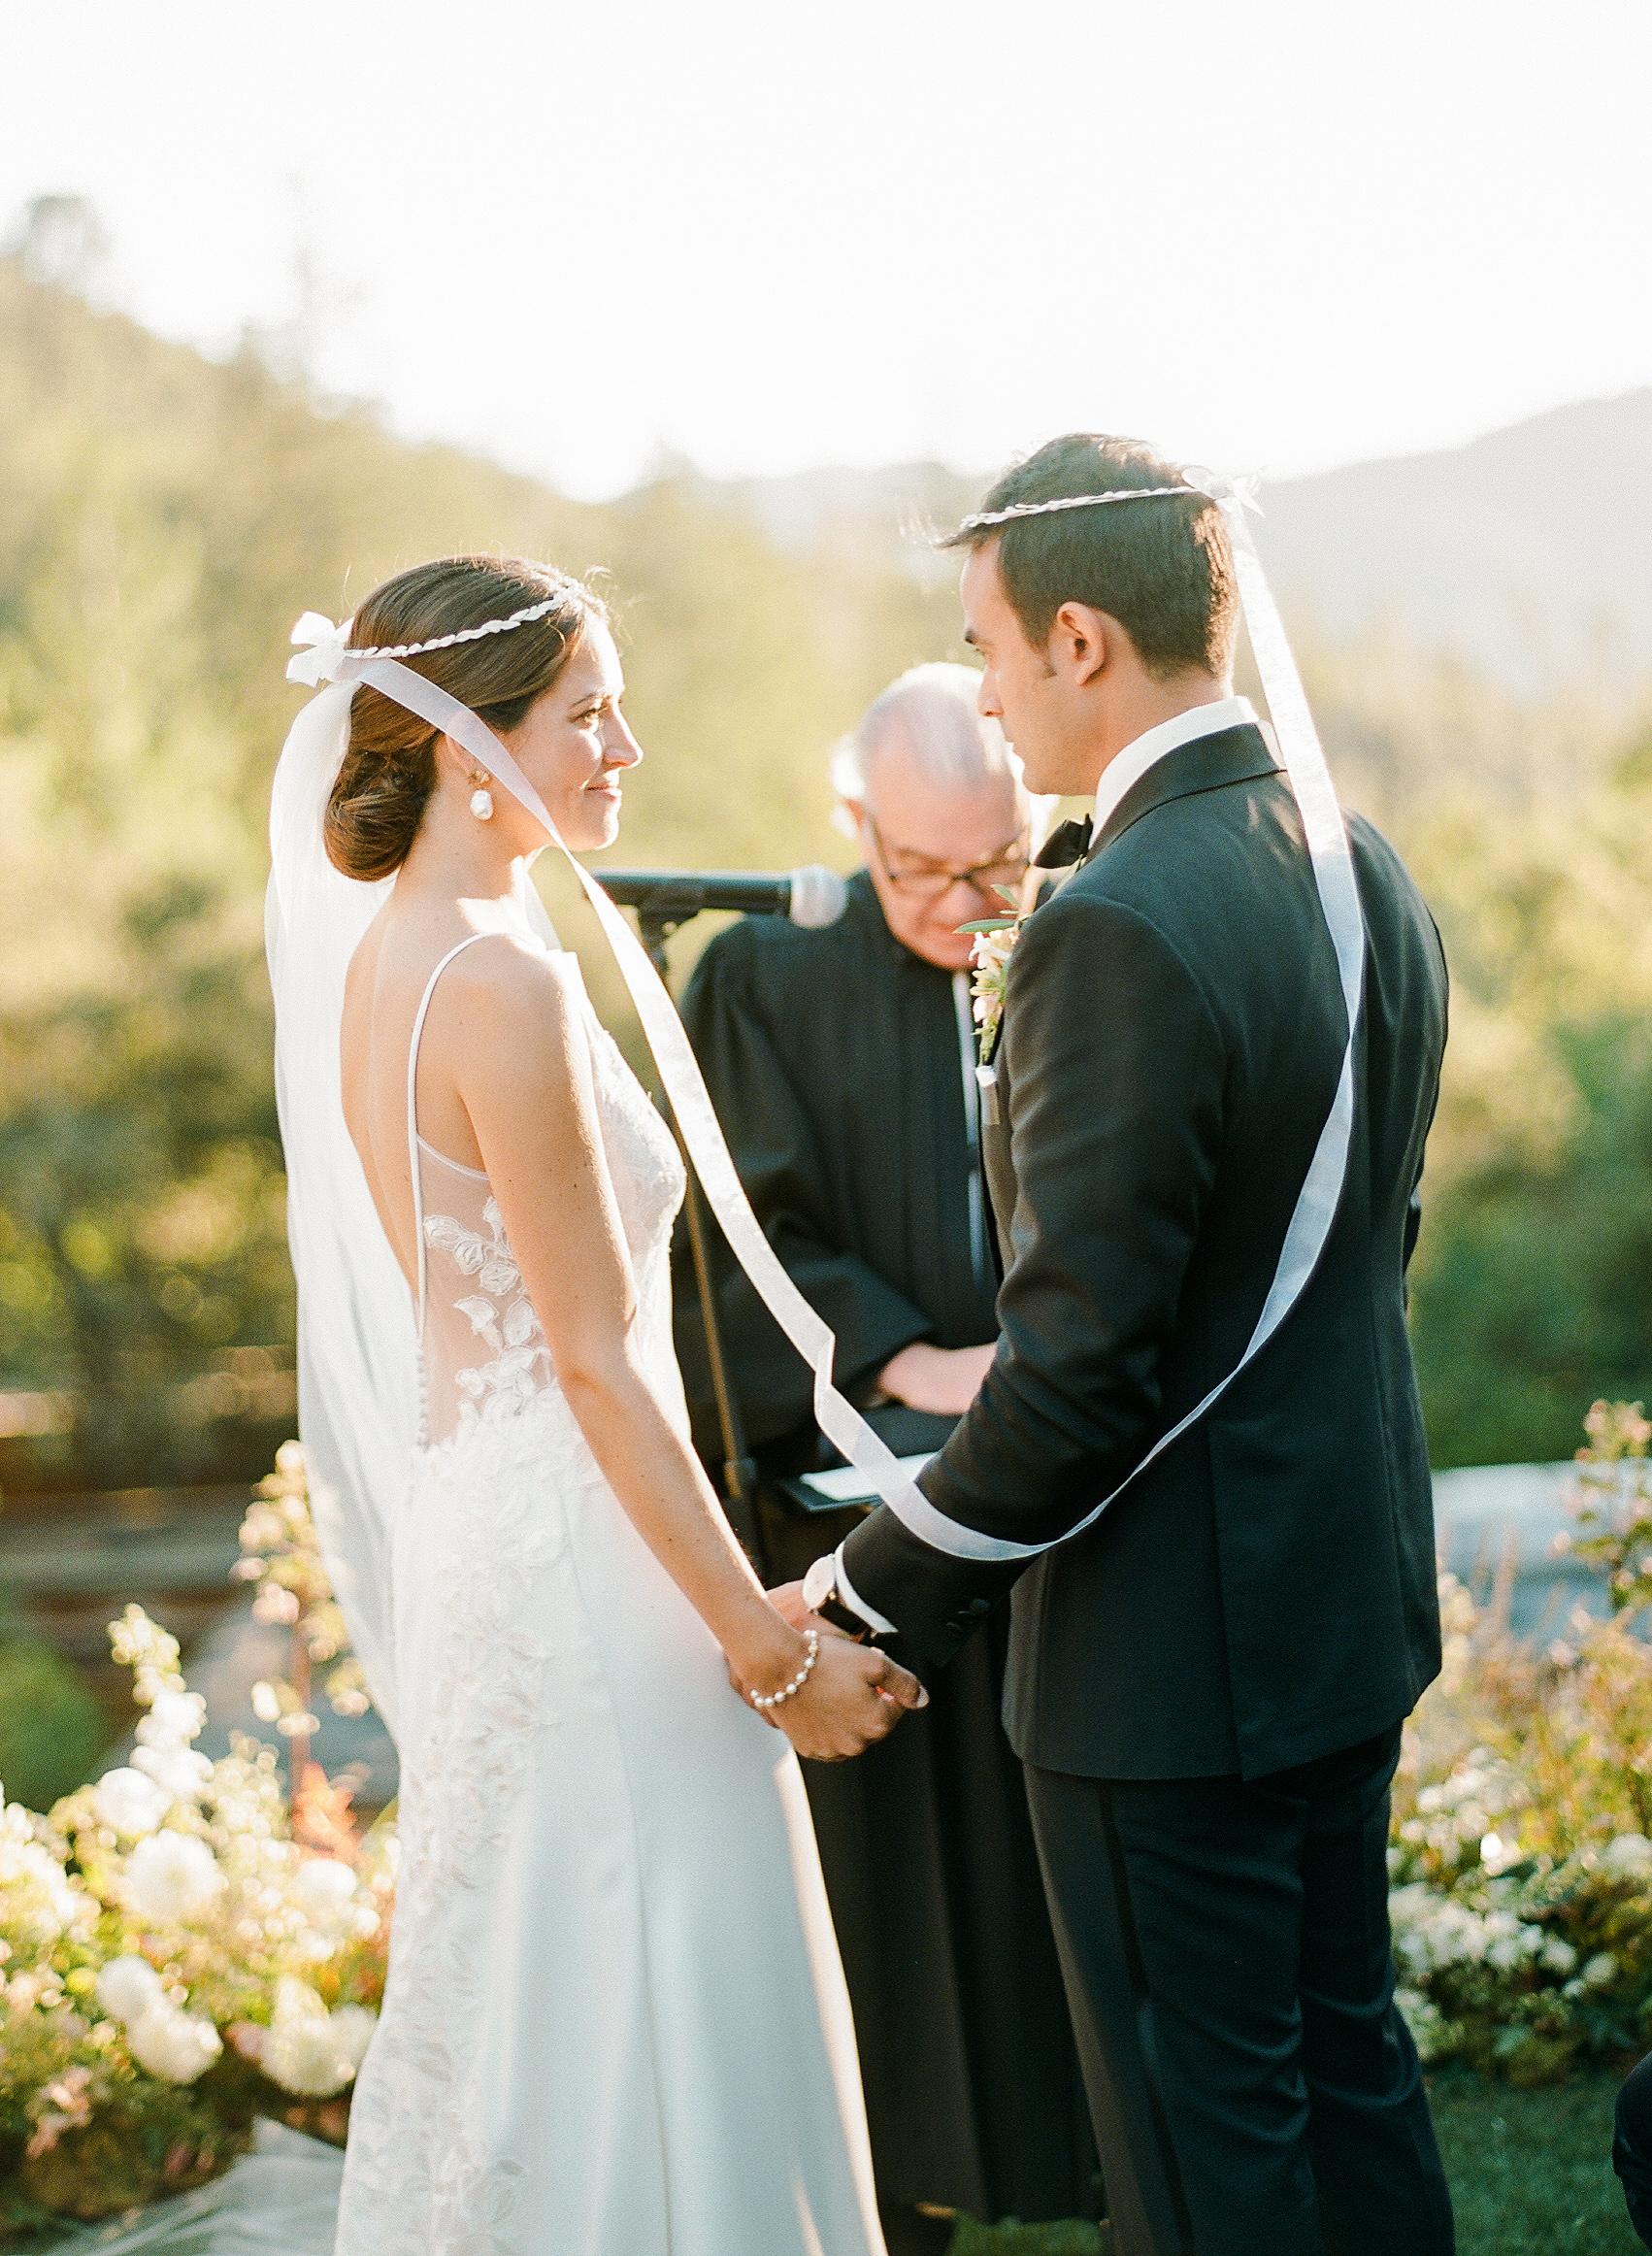 cristina chris wedding ceremony greek crowns couple alter